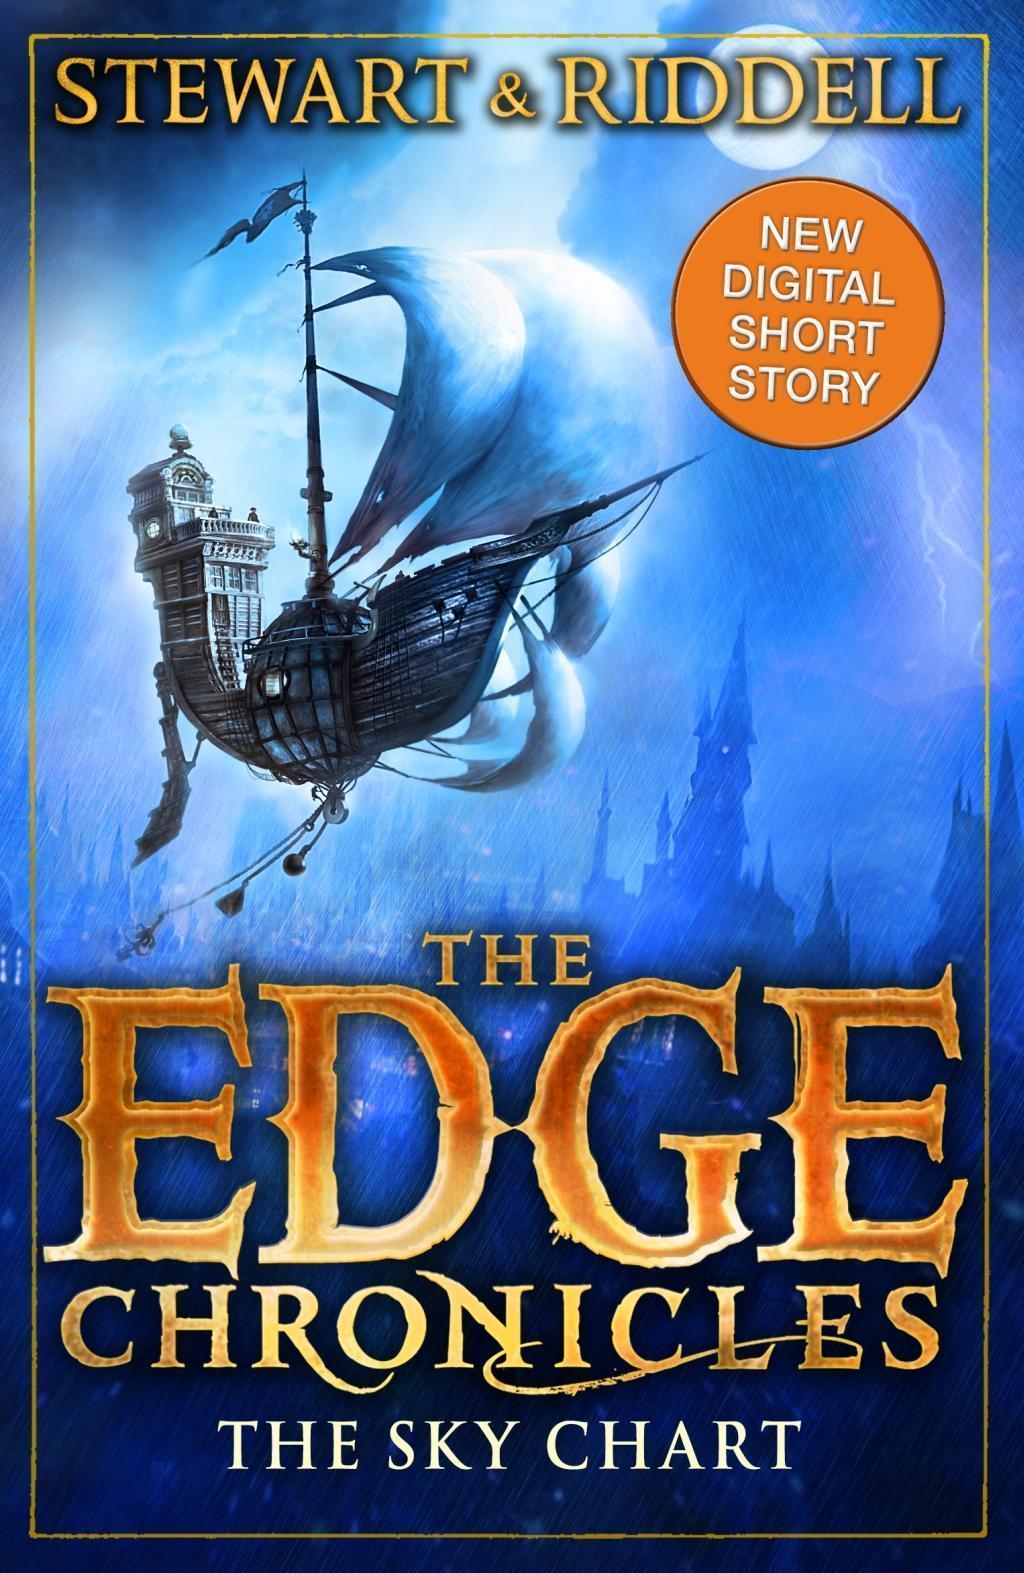 The Edge Chronicles: The Sky Chart